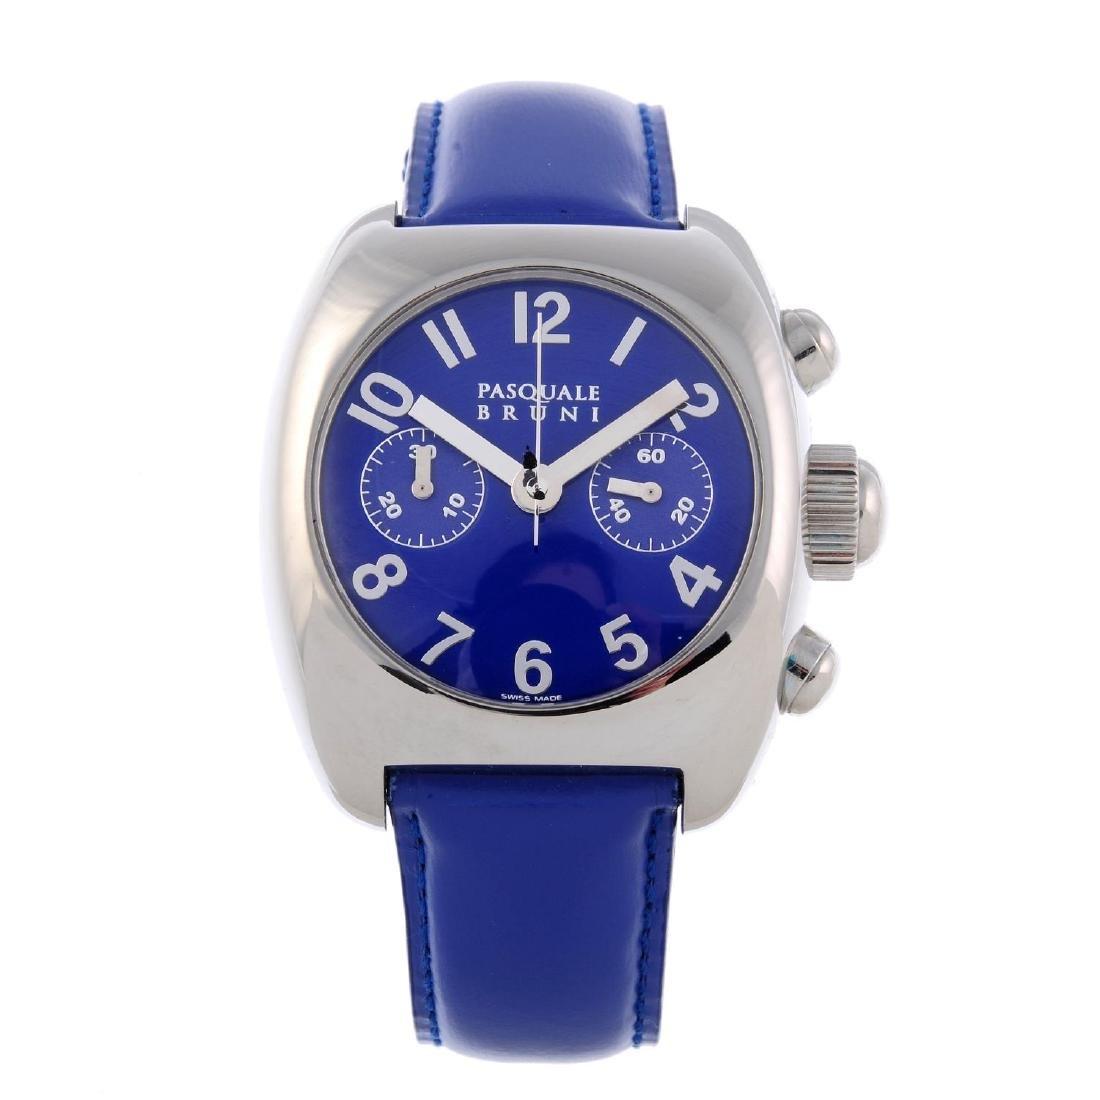 PASQUALE BRUNI - a gentleman's Uomo chronograph wrist